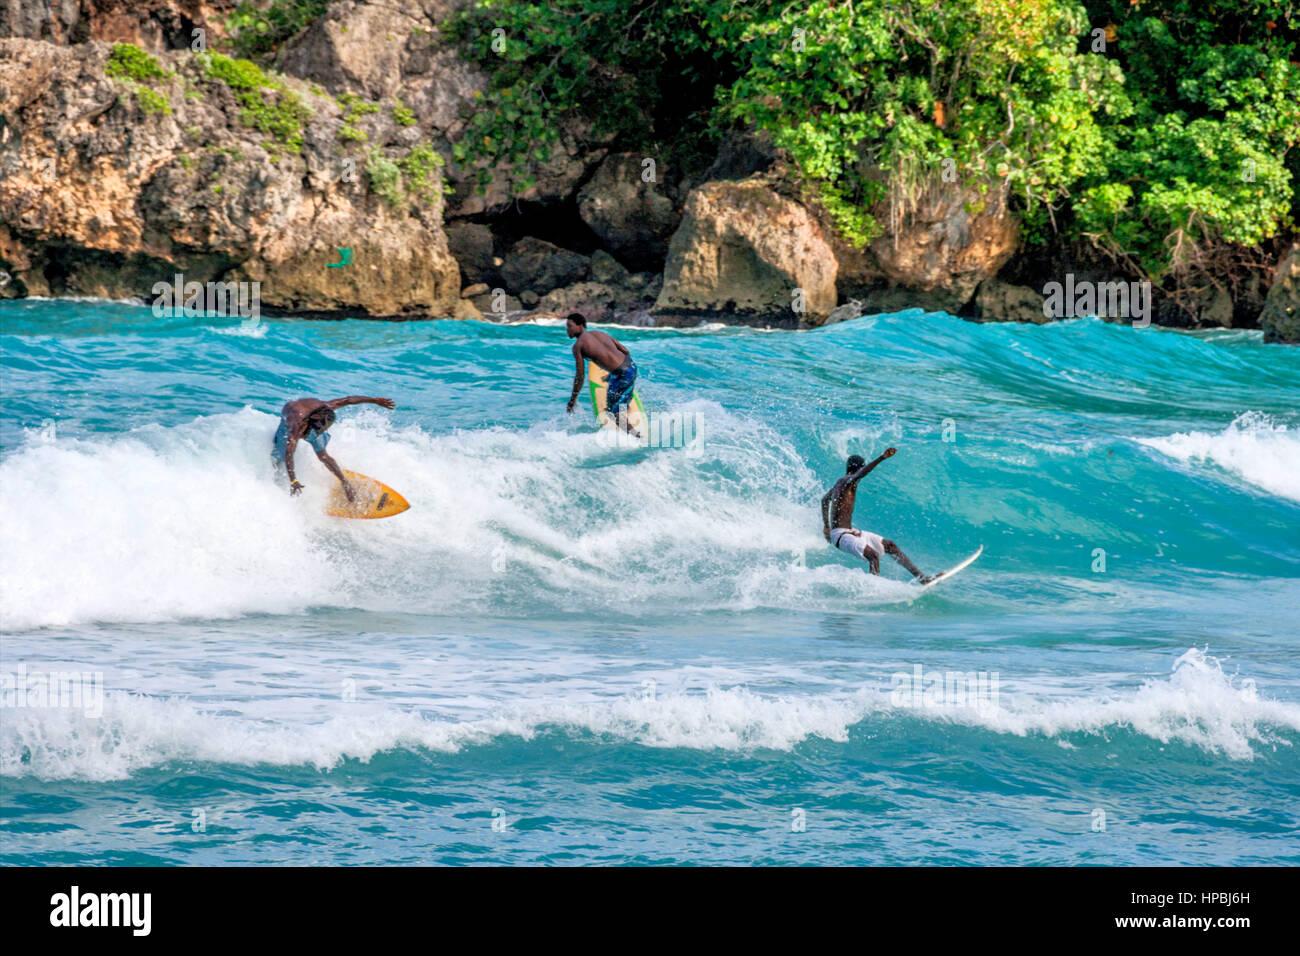 Surfer, Boston bay, watersports, waves, surfing, Jamaica, Jamaika Stock Photo